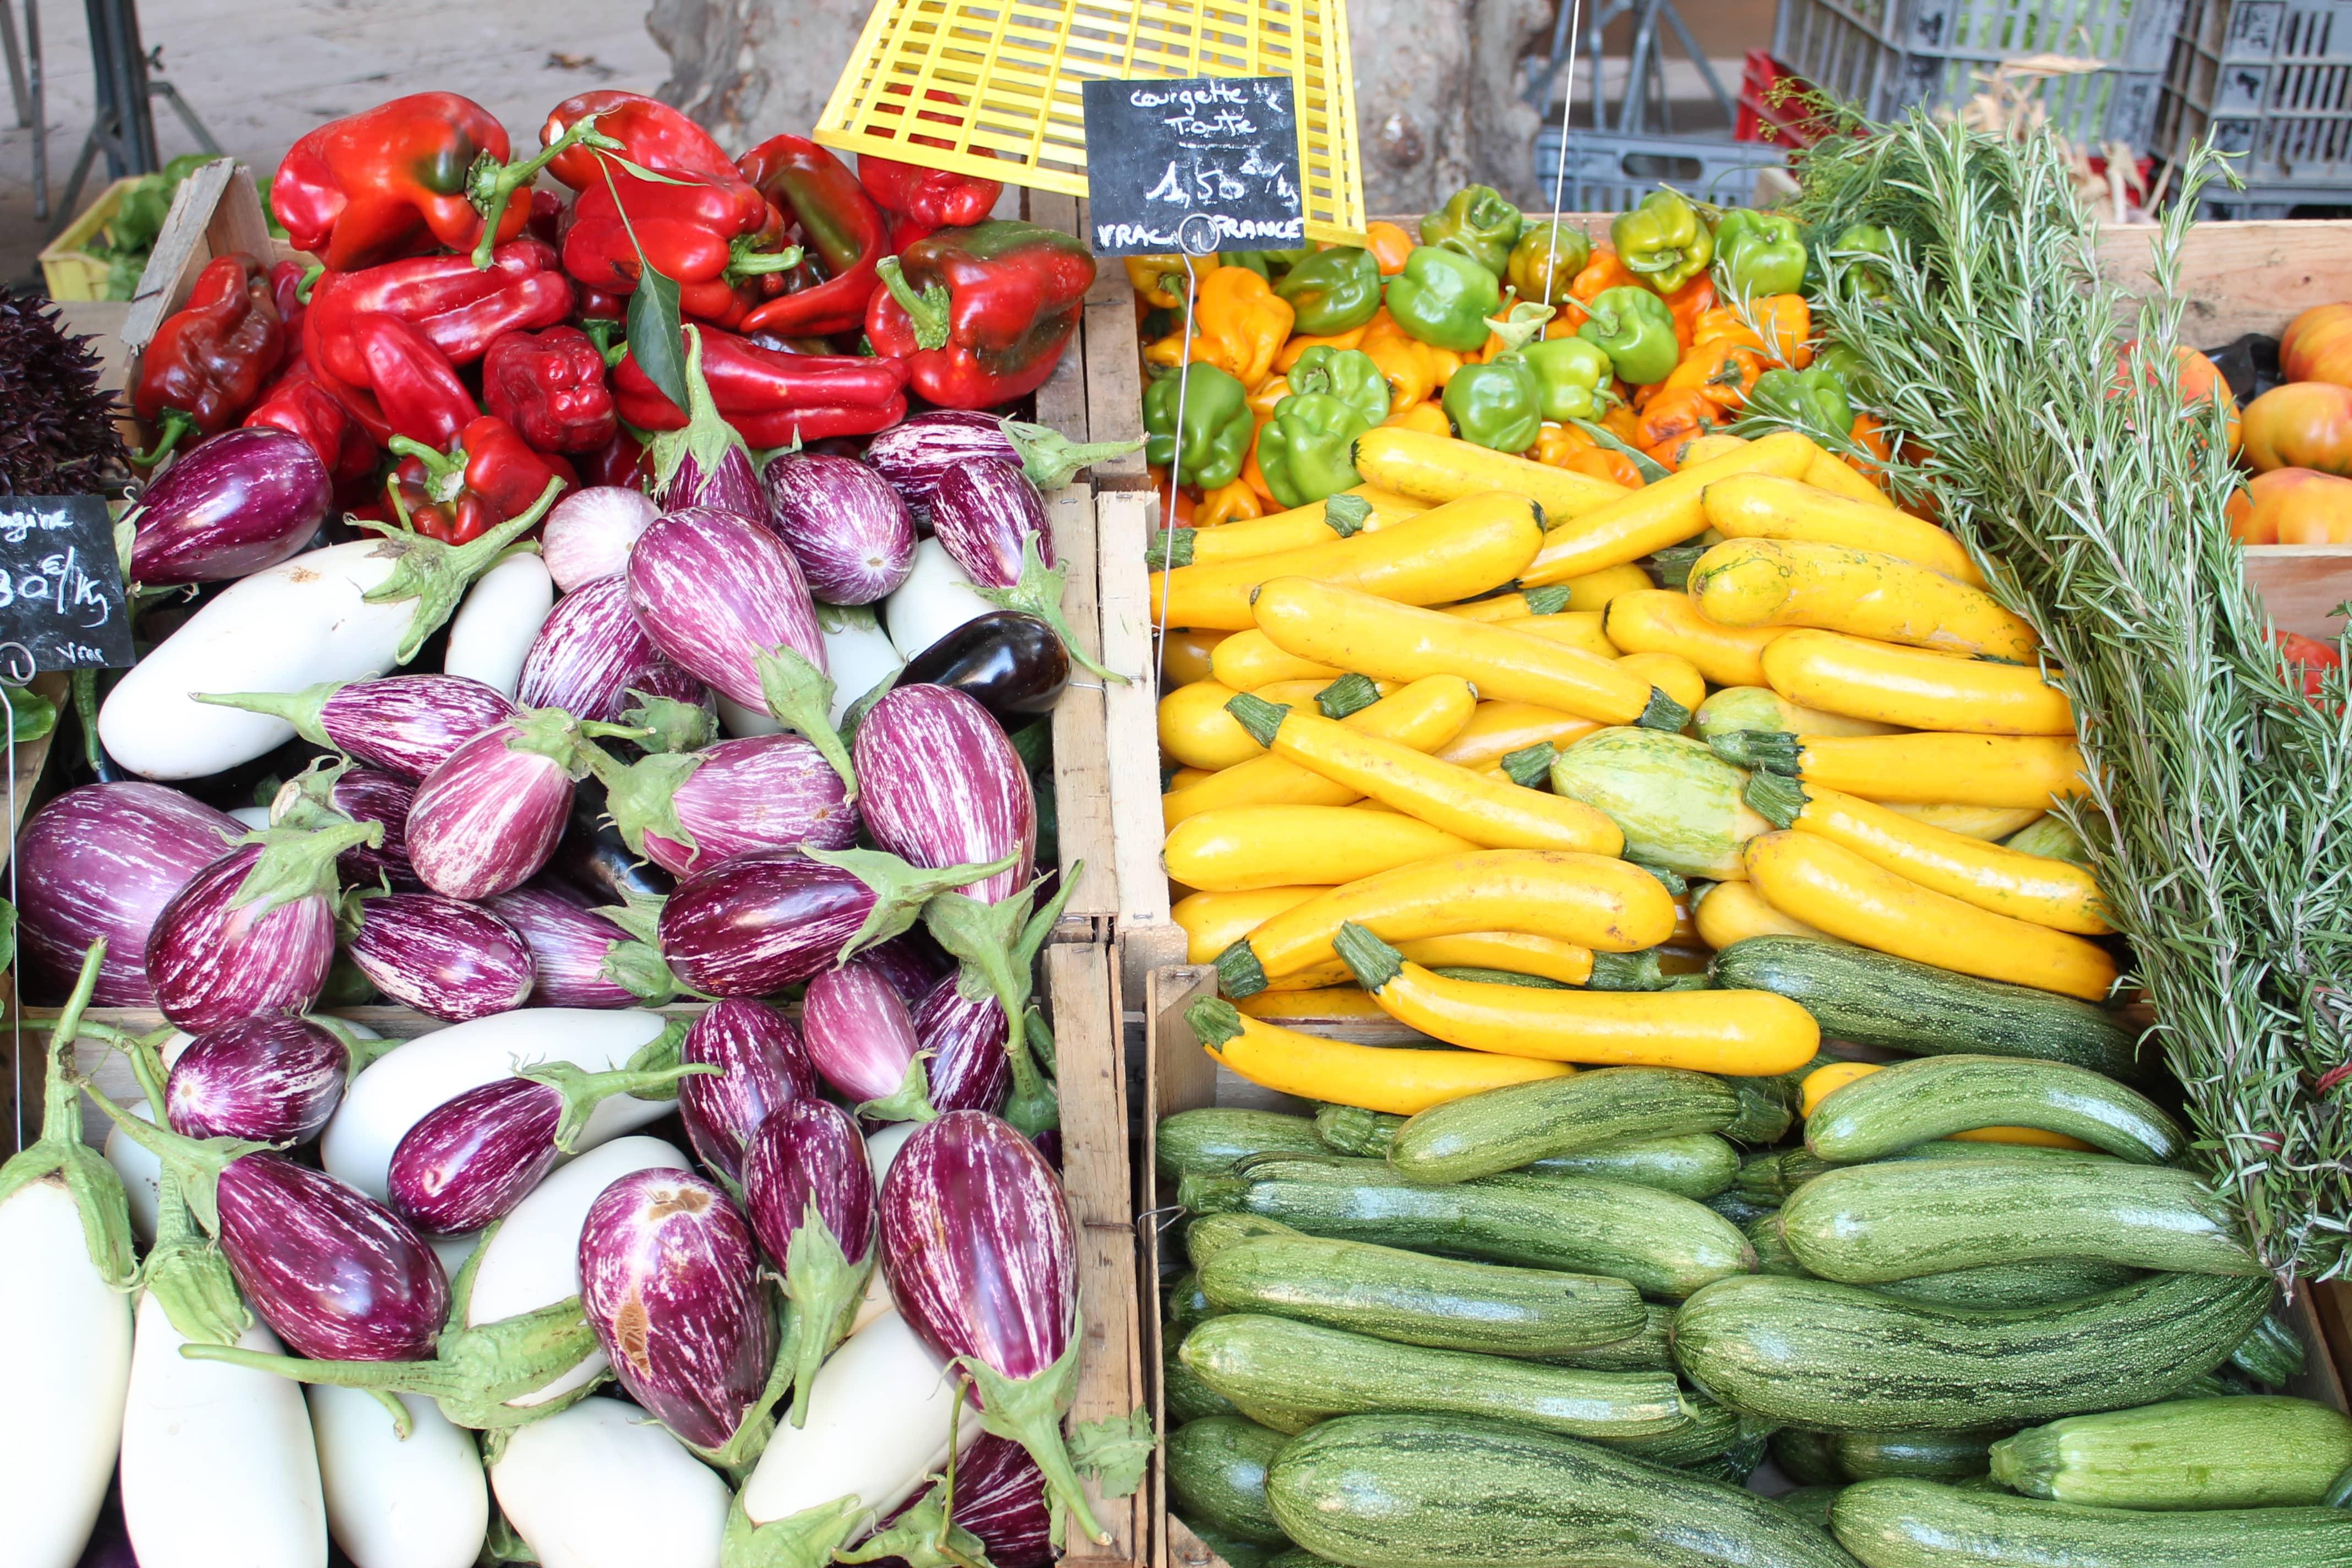 Shore excursion, vegetable stand, Marseille